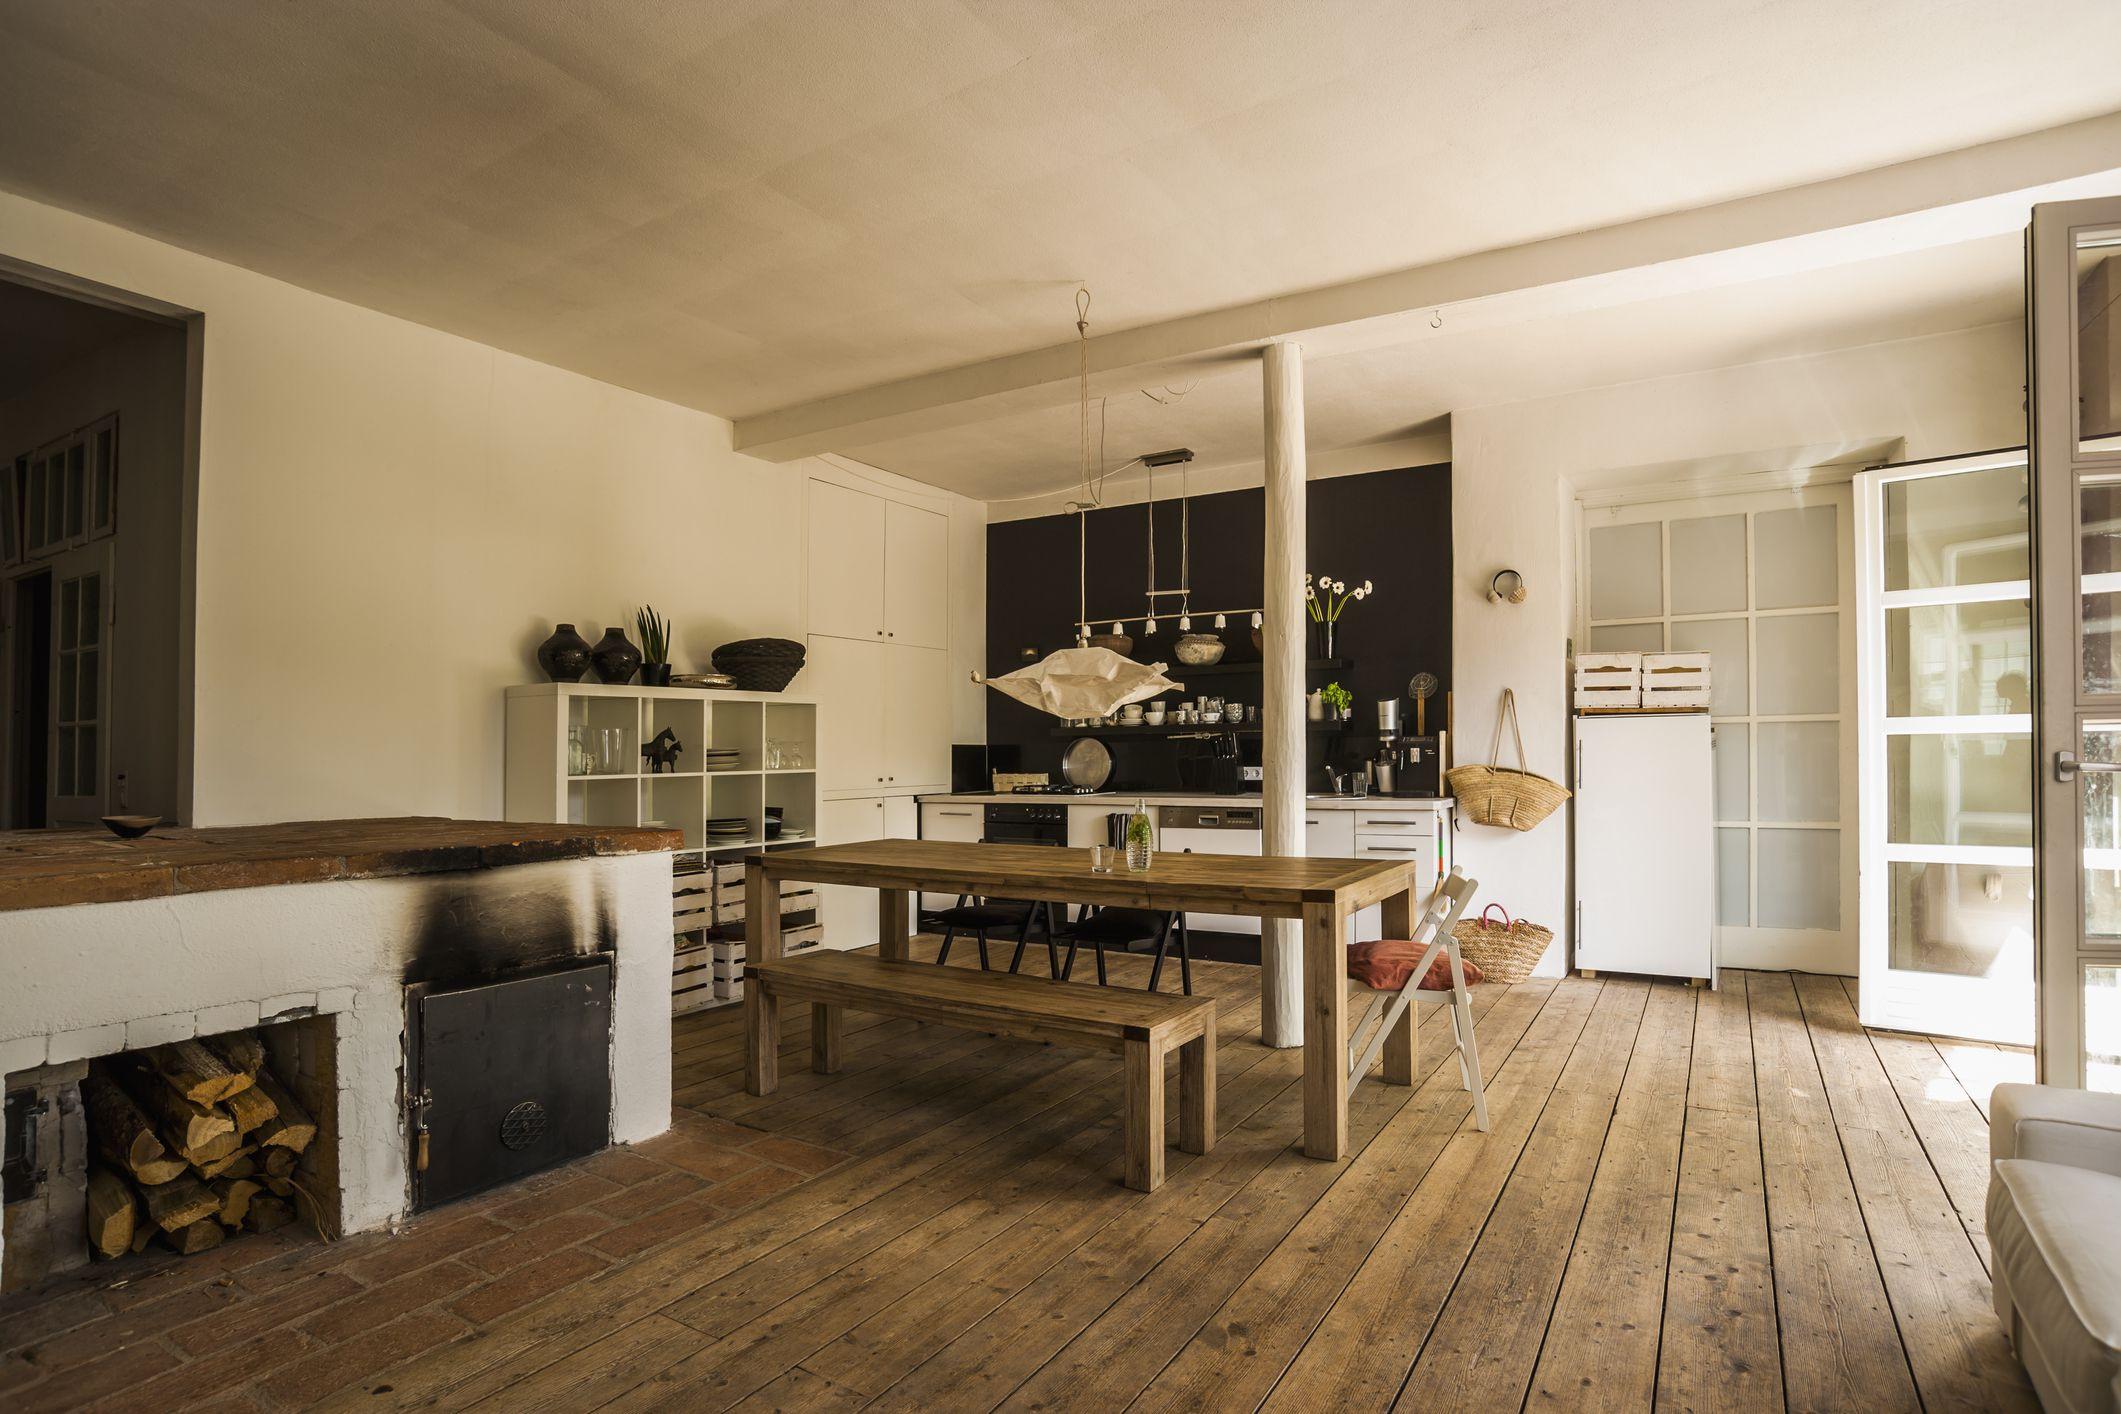 how to select hardwood floor color of vinyl wood flooring versus natural hardwood throughout diningroom woodenfloor gettyimages 544546775 590e57565f9b58647043440a